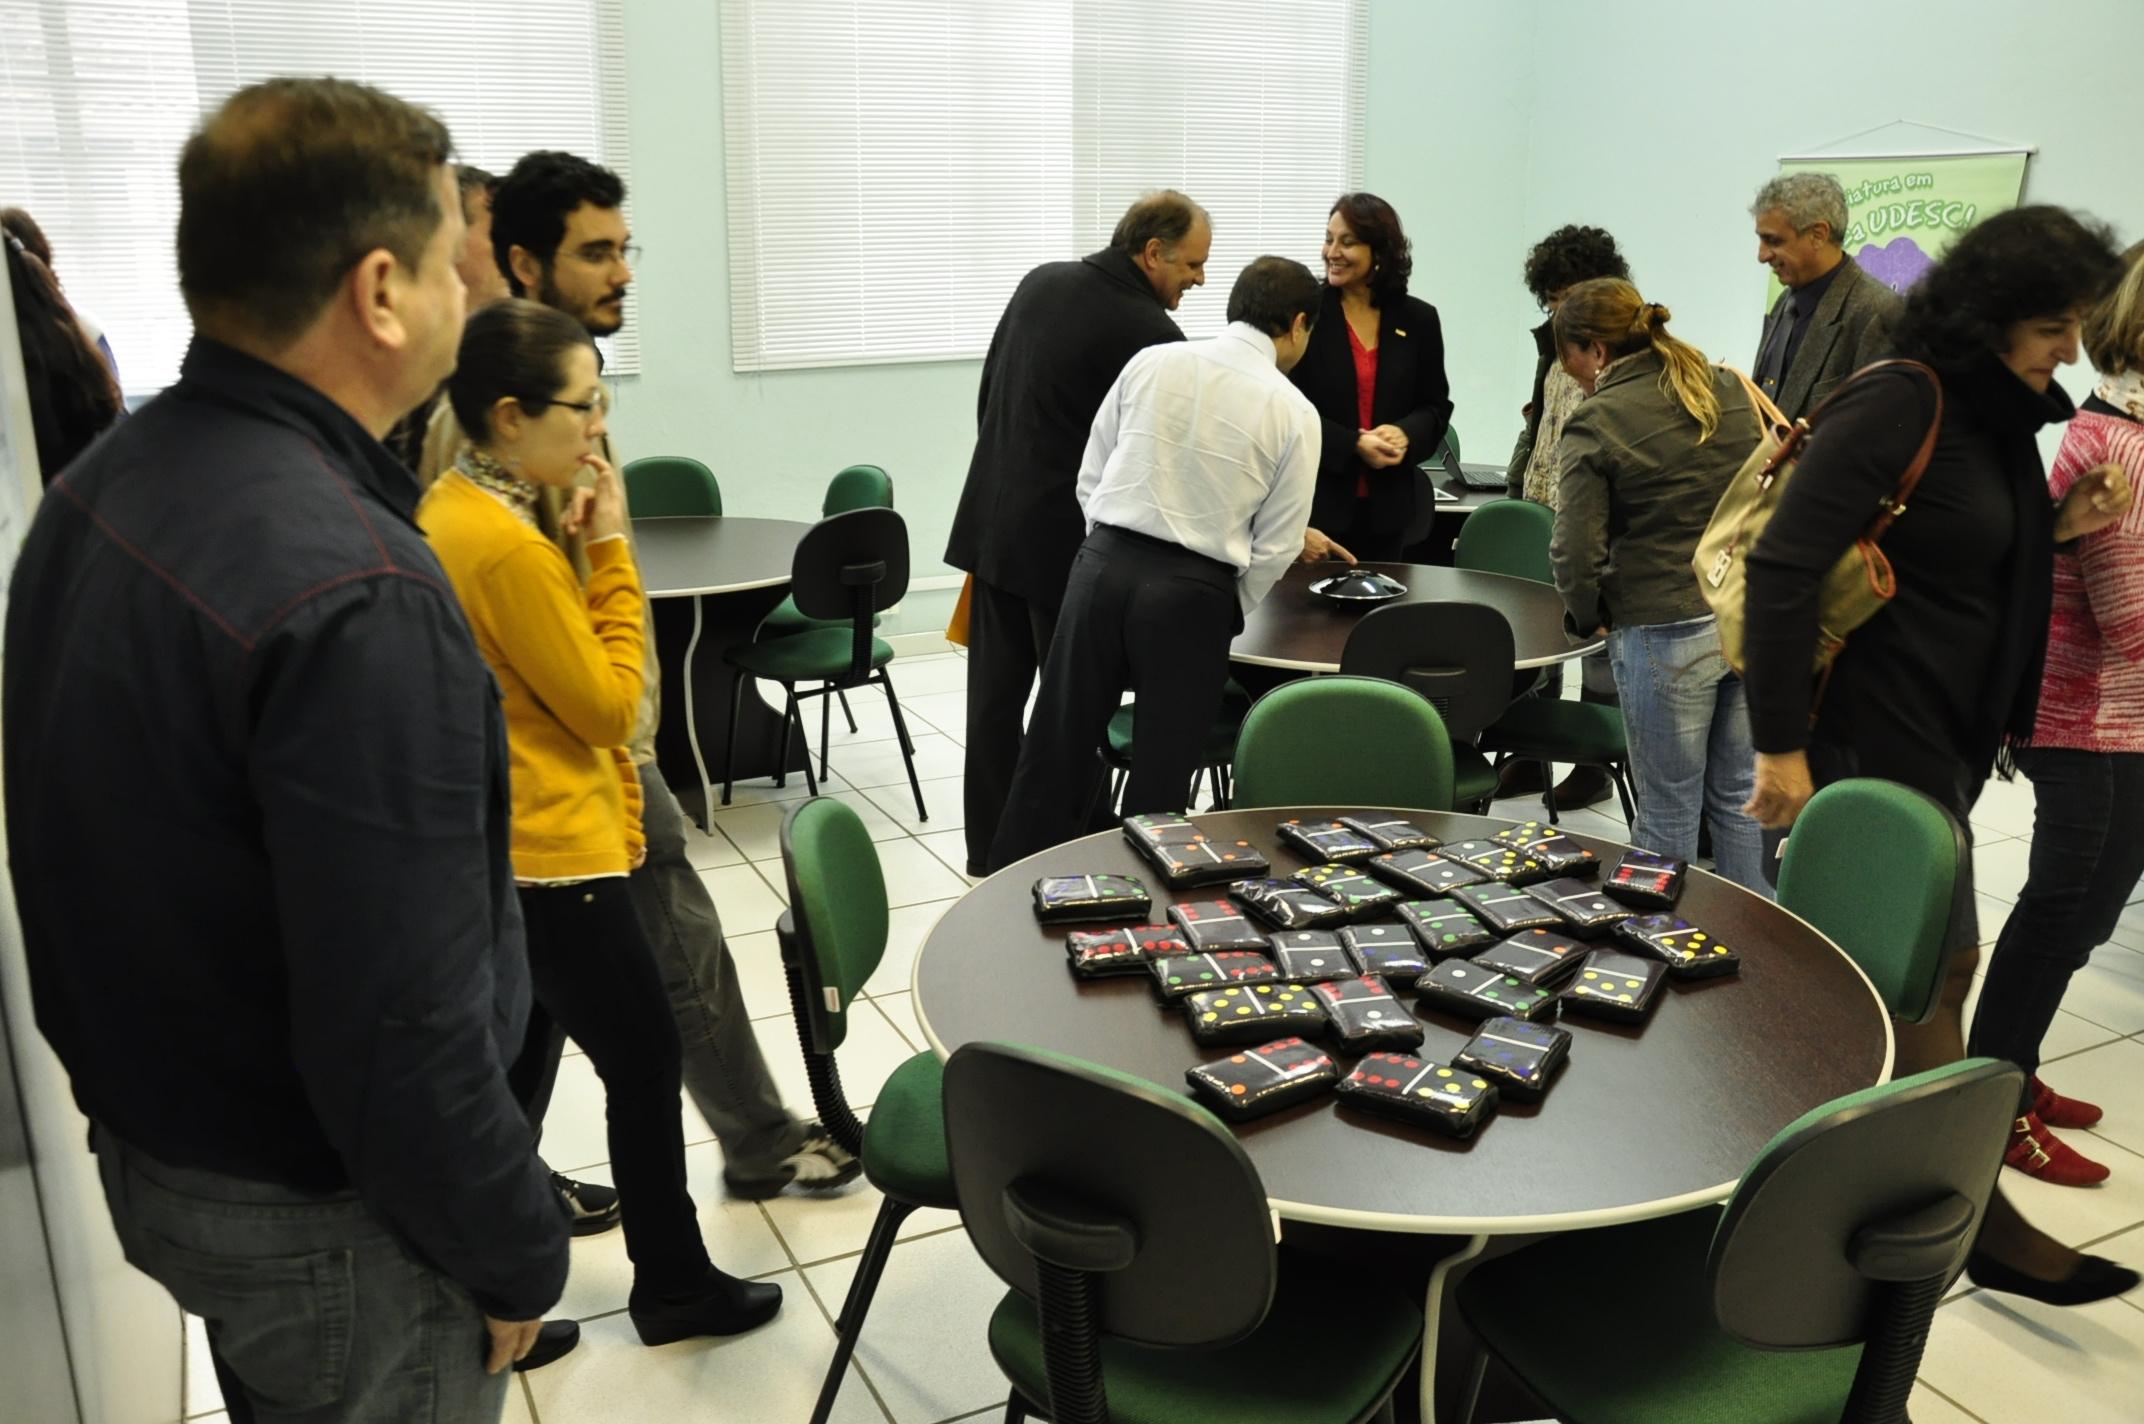 udesc-joinville-oferece-curso-na-area-de-matematica-para-professores-da-educacao-infantil